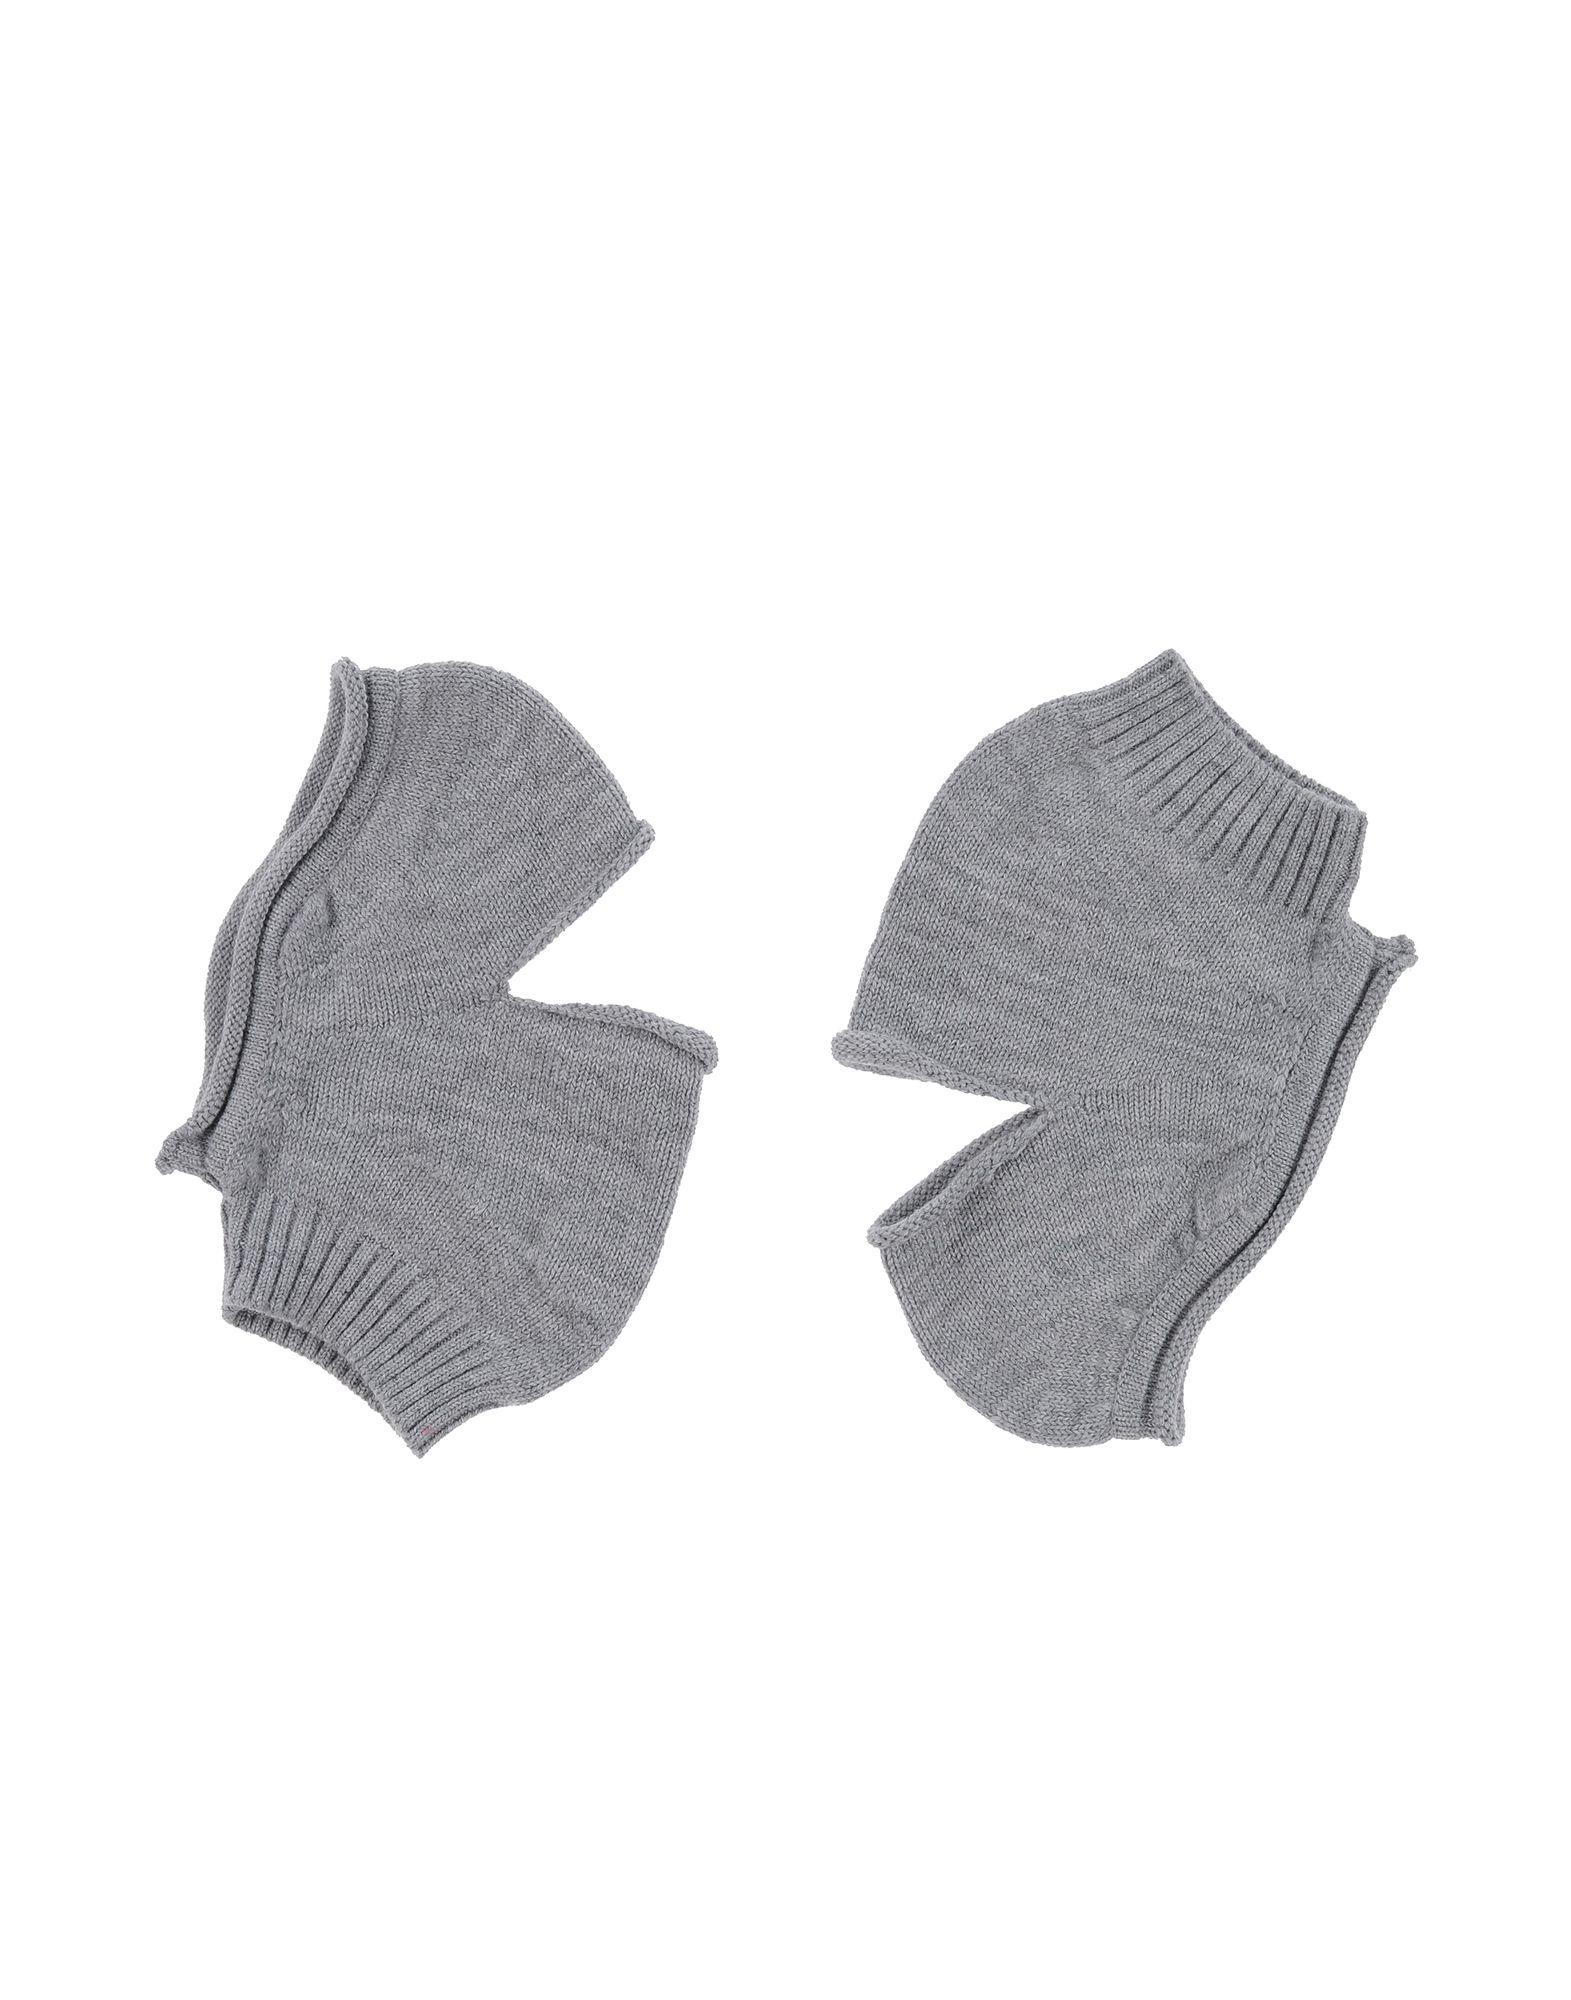 LE JEAN DE MARITHÉ + FRANÇOIS GIRBAUD Гетры для рук le jean de marithé françois girbaud джинсовая юбка